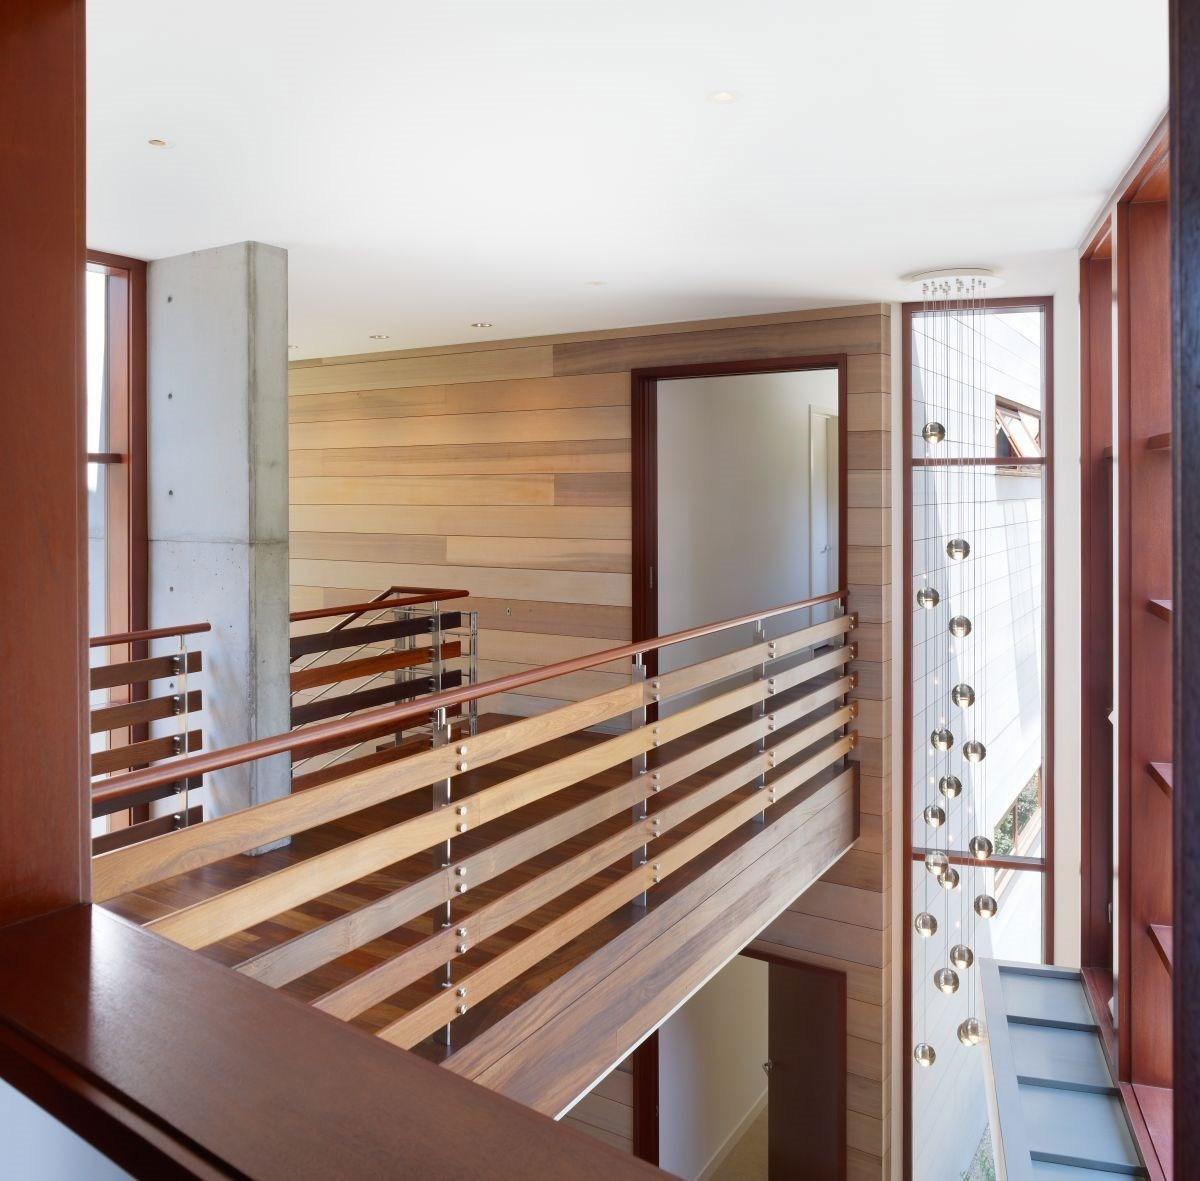 Indoor Bridge And Railings Design Using Wood Ideas Photo | Internal Staircase Railing Designs